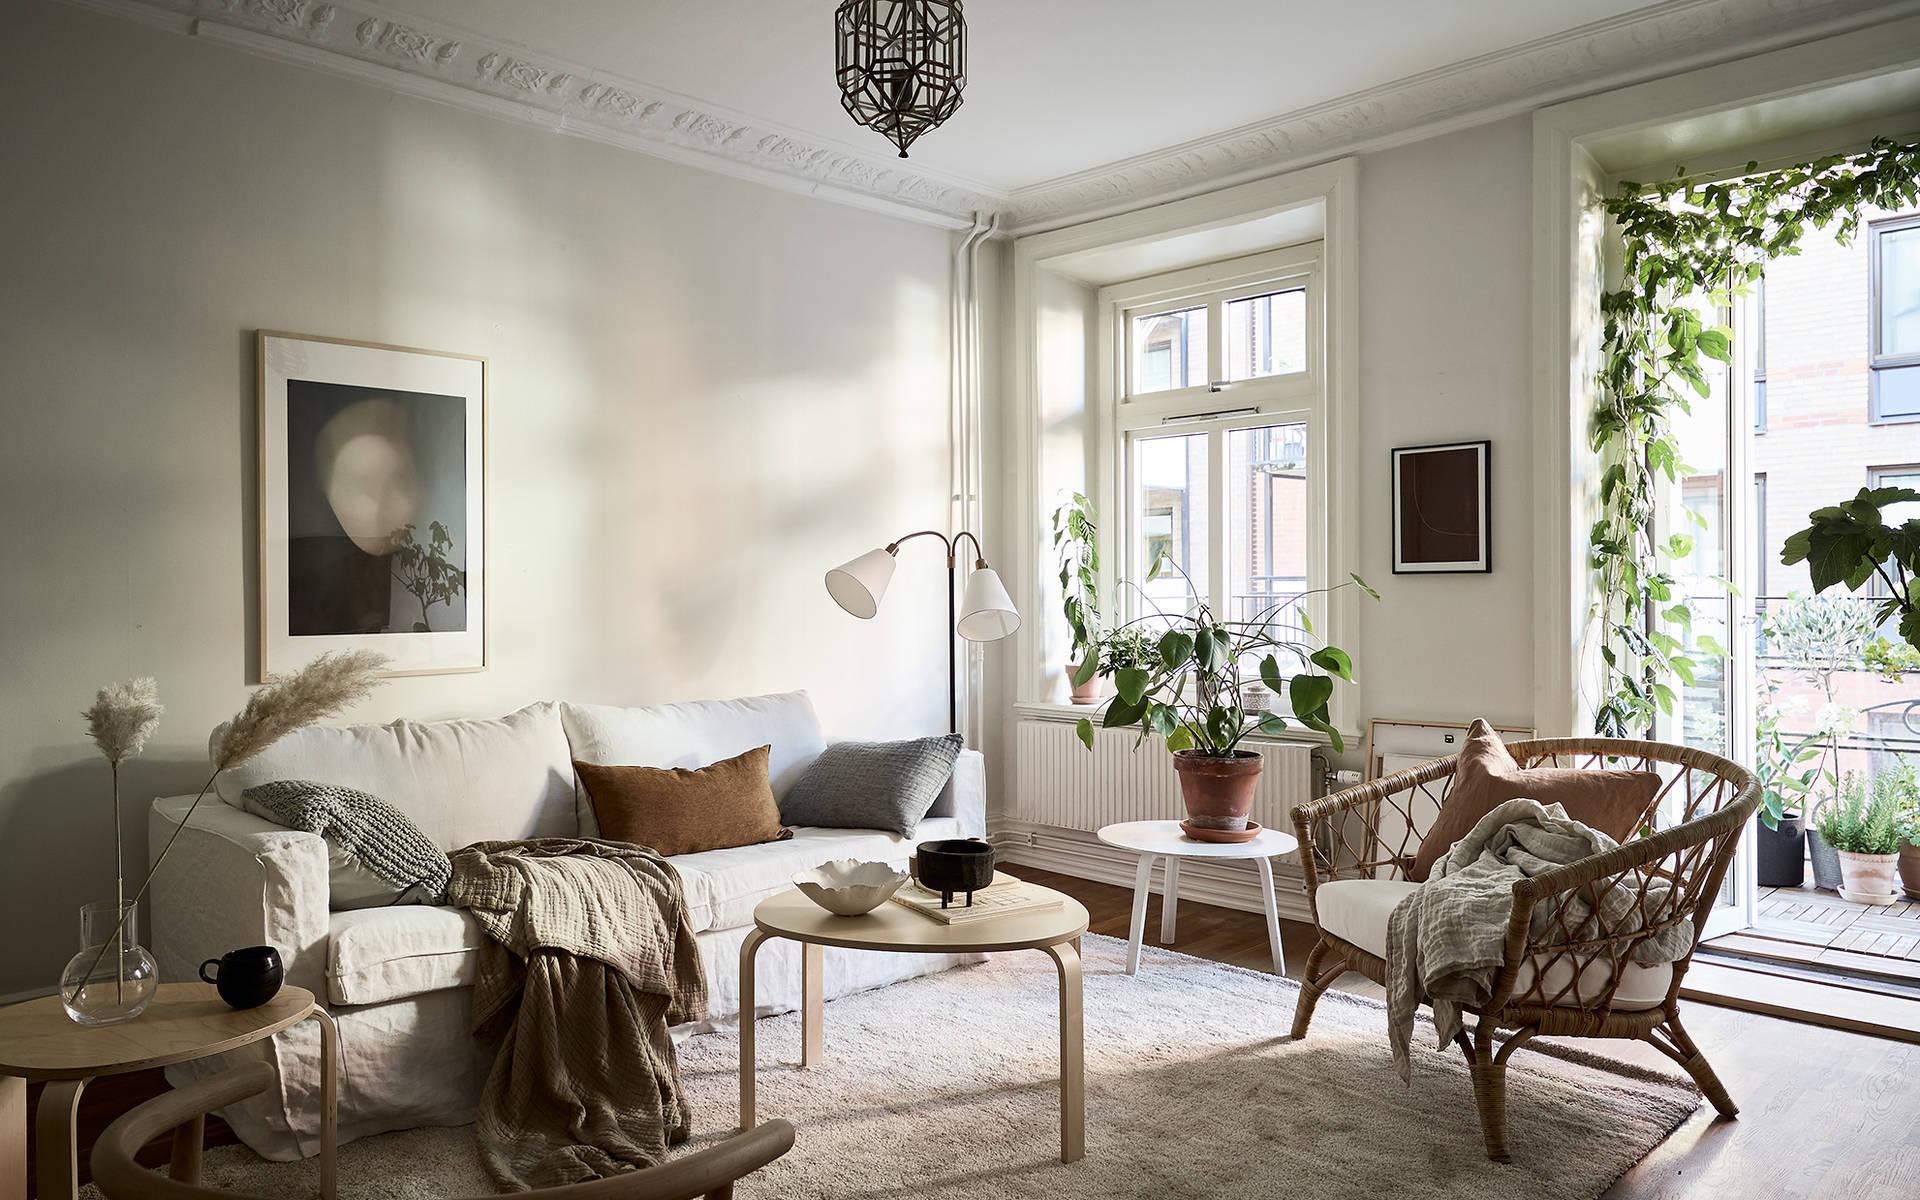 How to Get Scandinavian Modern Style - Vinterior